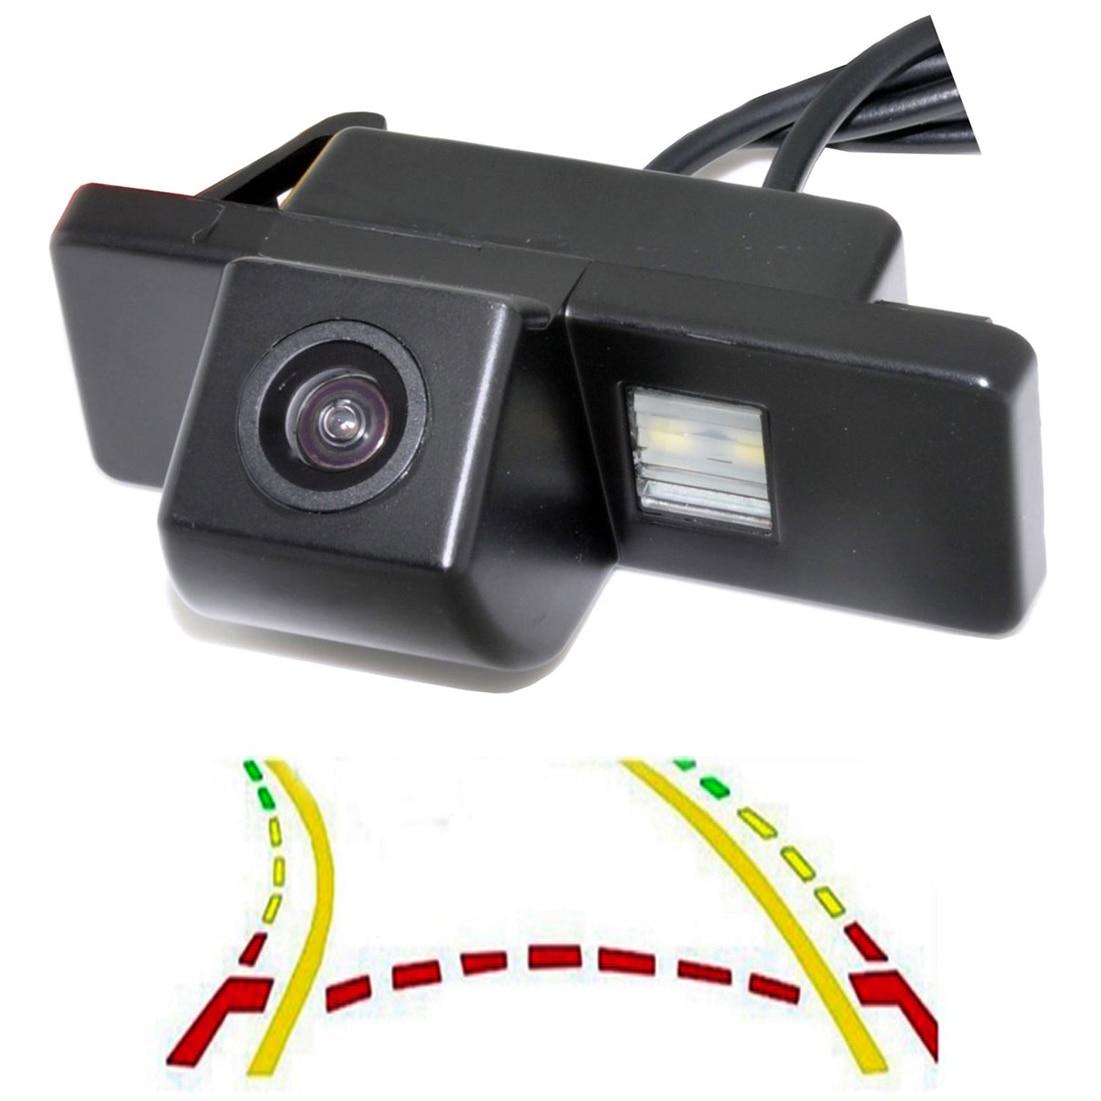 CCD  Intelligent Dynamic Trajectory Tracks Rear View Camera For NISSAN Juke QASHQAI/Geniss/Pathfinder/X-TRAIL Sunny